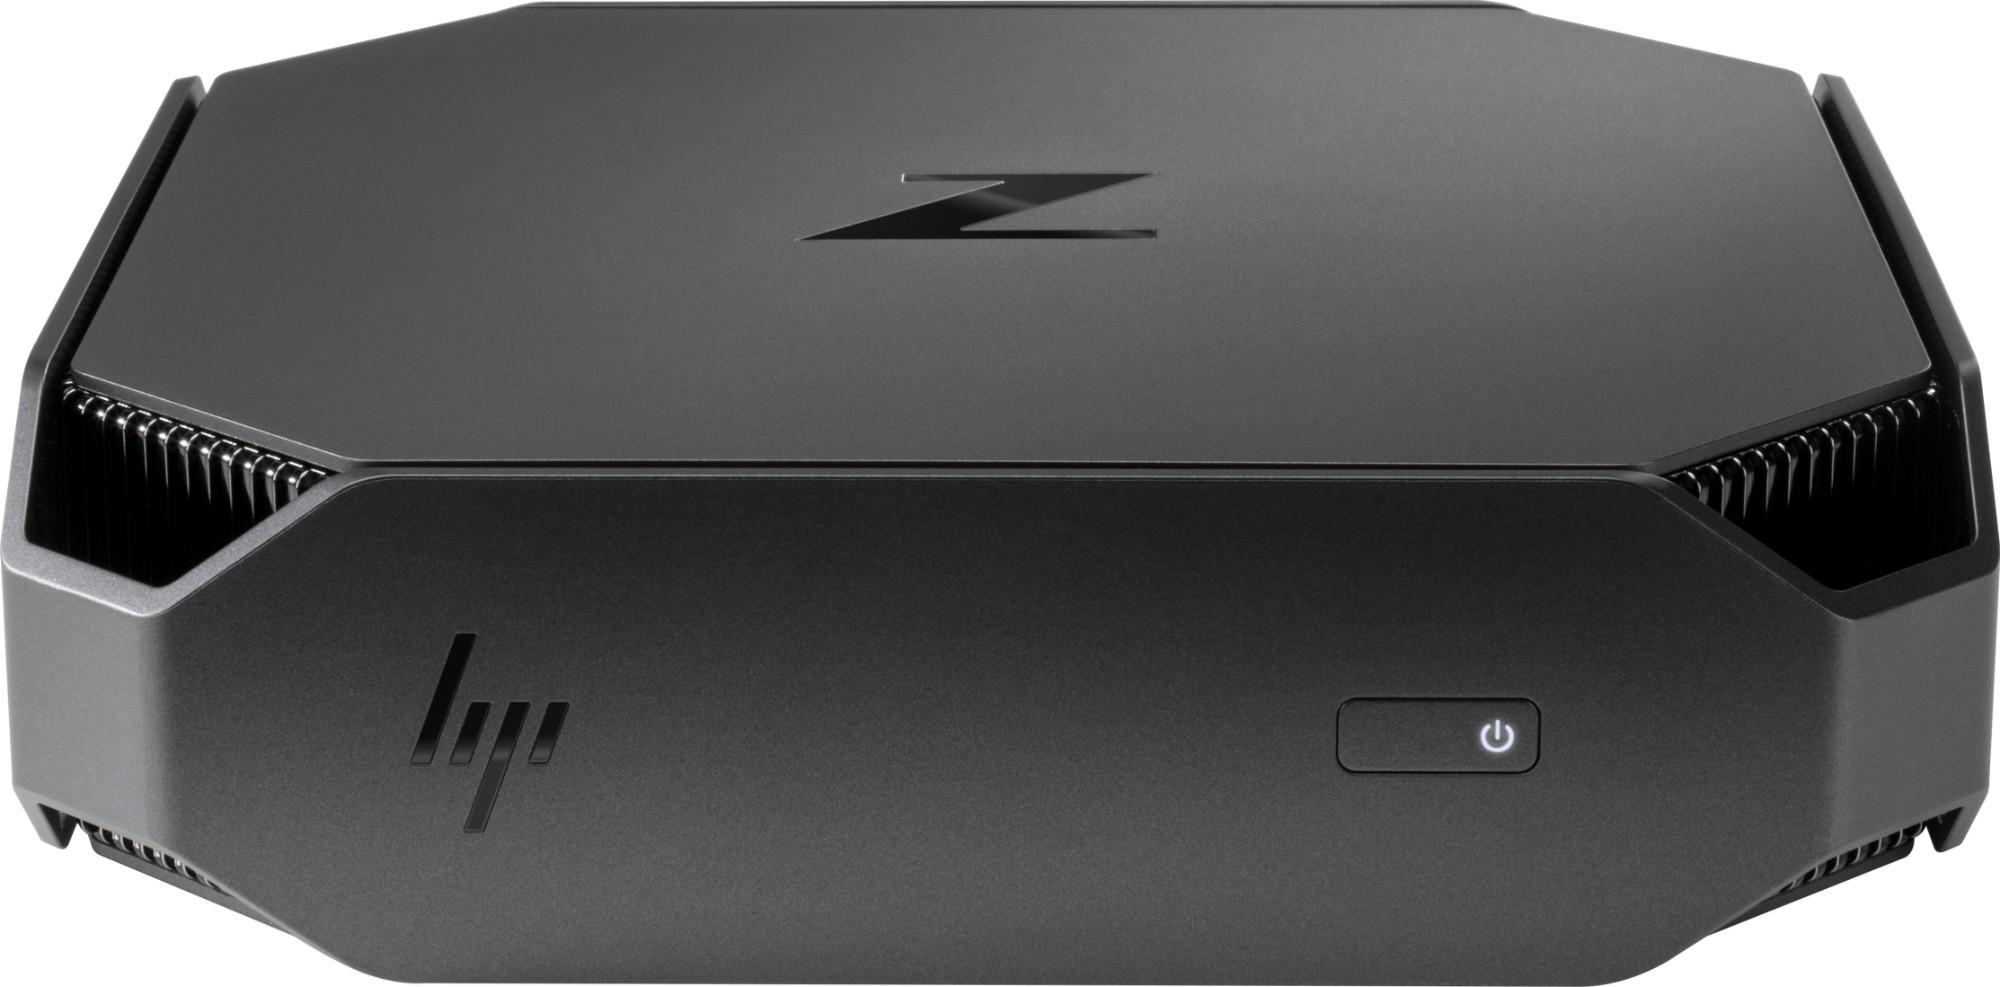 Workstation Z2 G4 Mini - i7 8700 - 16GB RAM - 512GB SSD - Win10 Pro